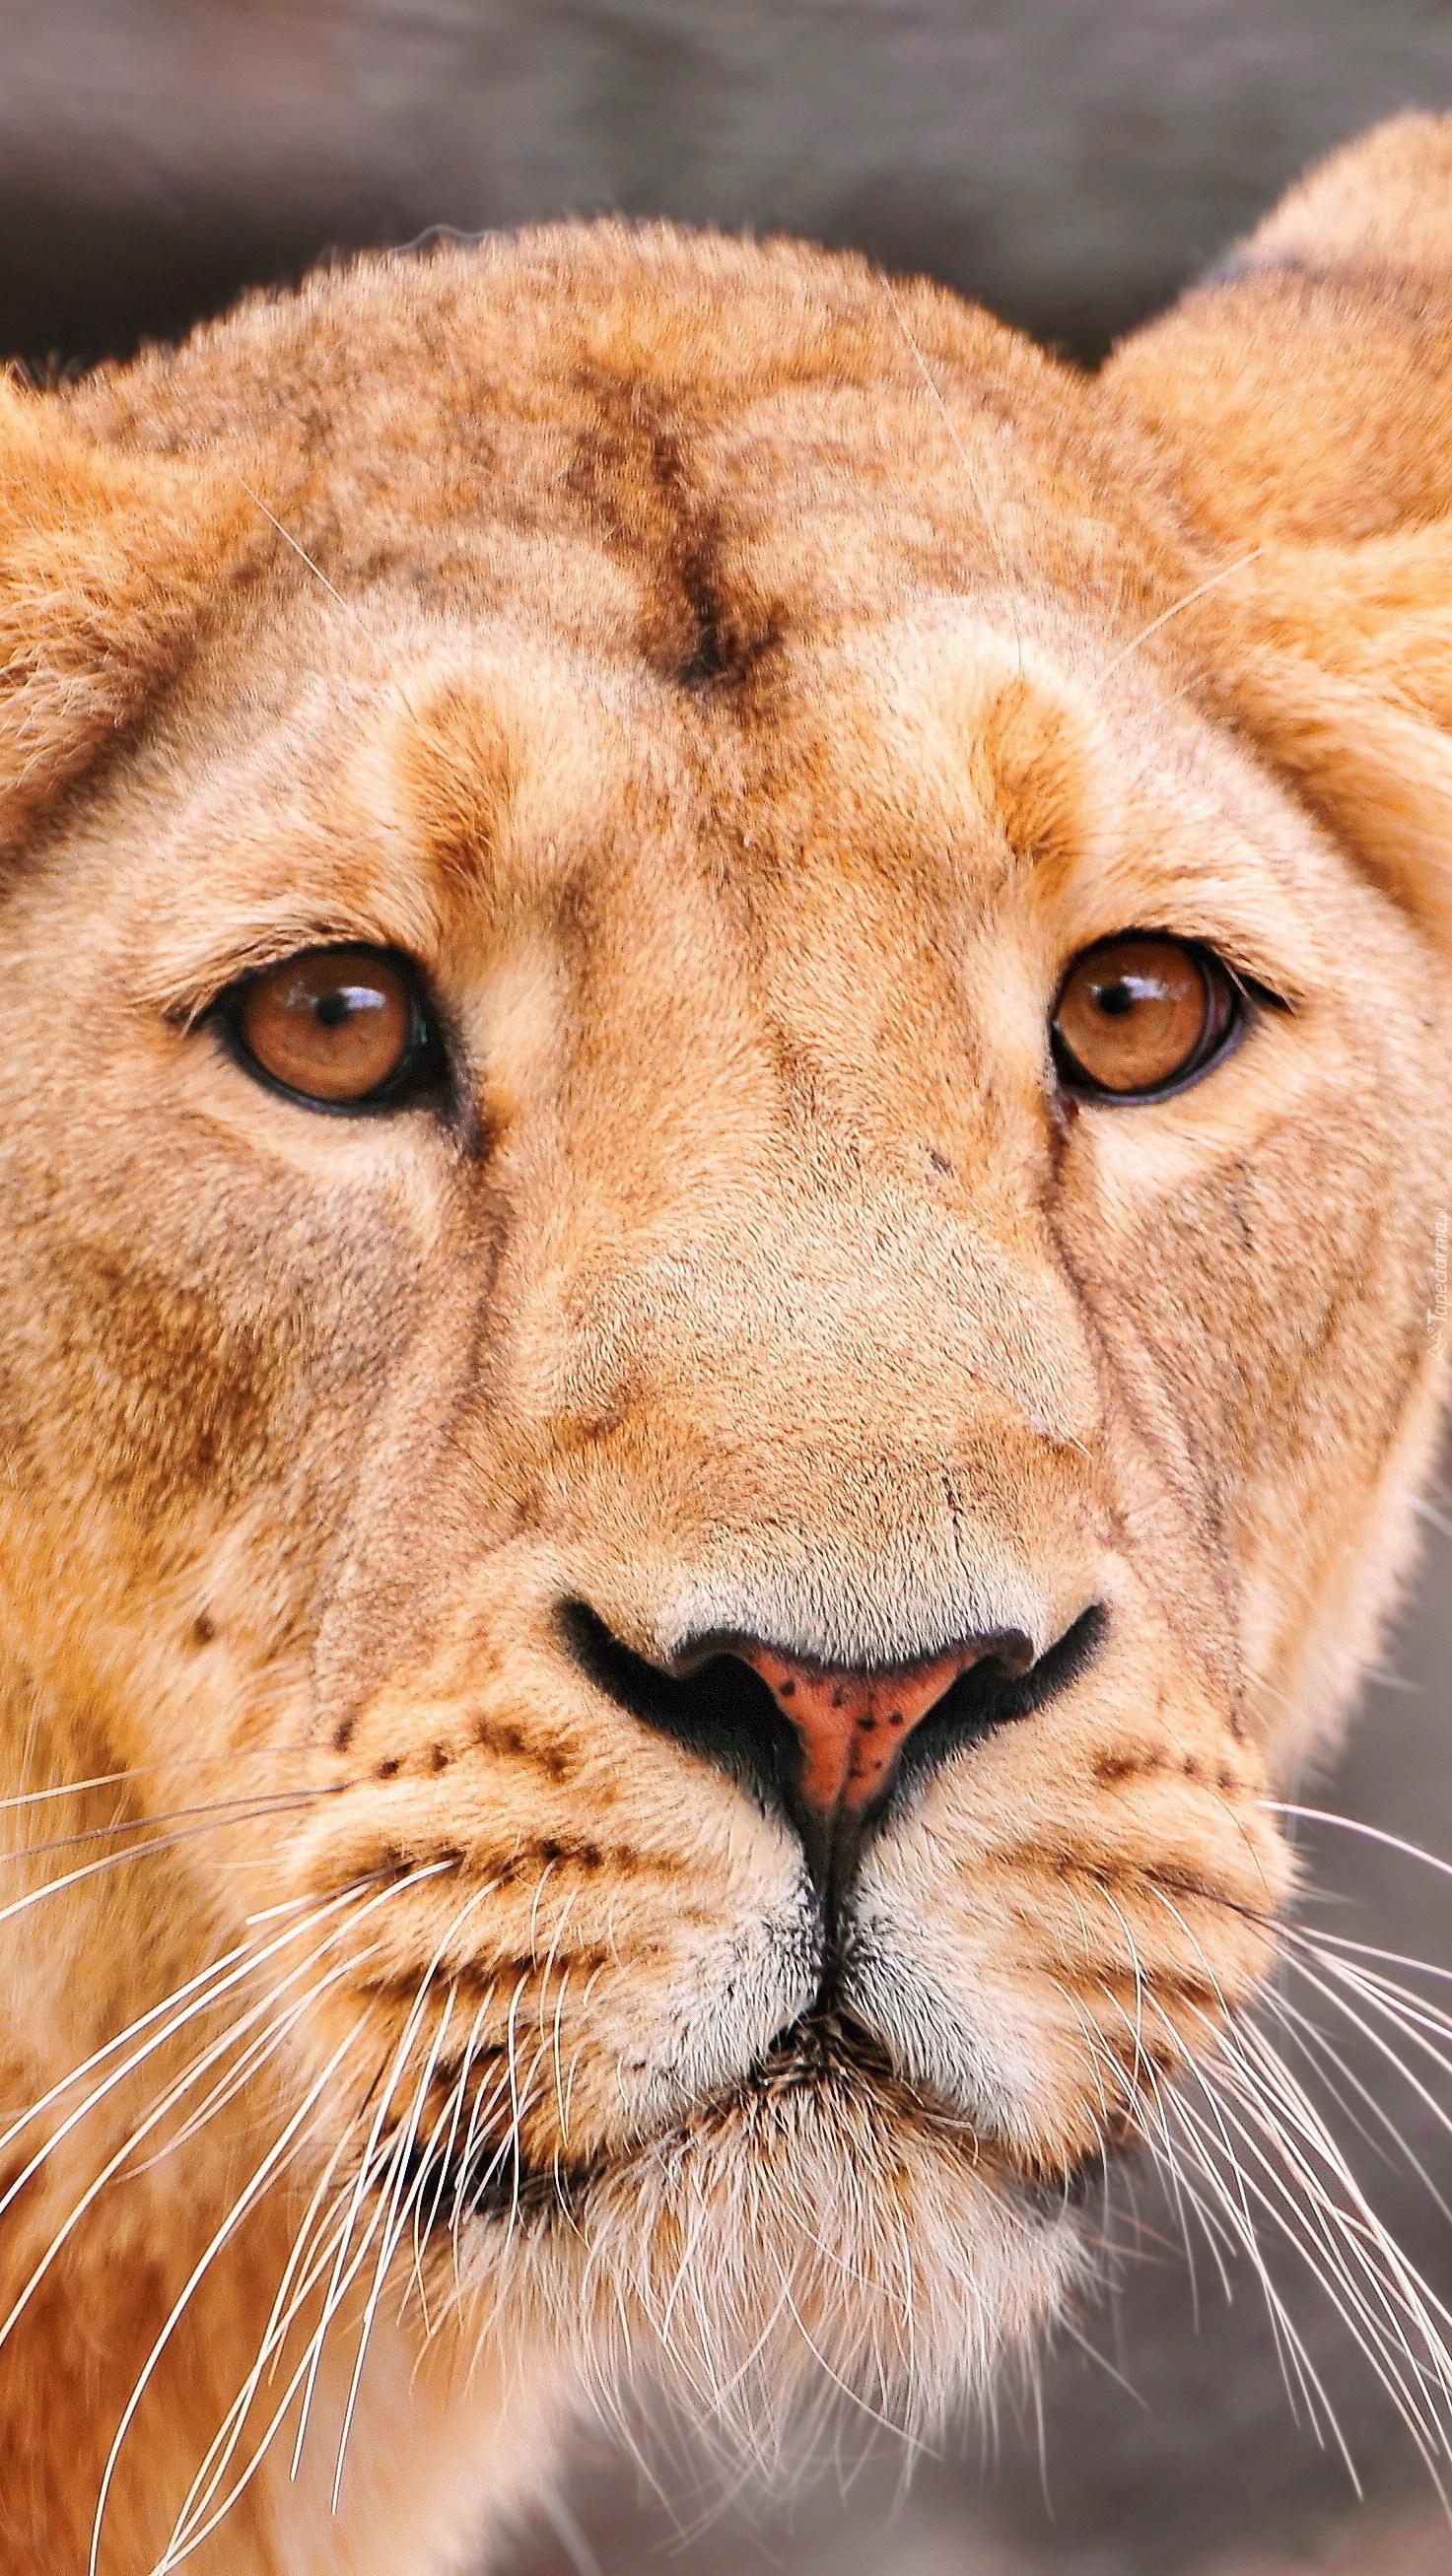 Łeb lwicy